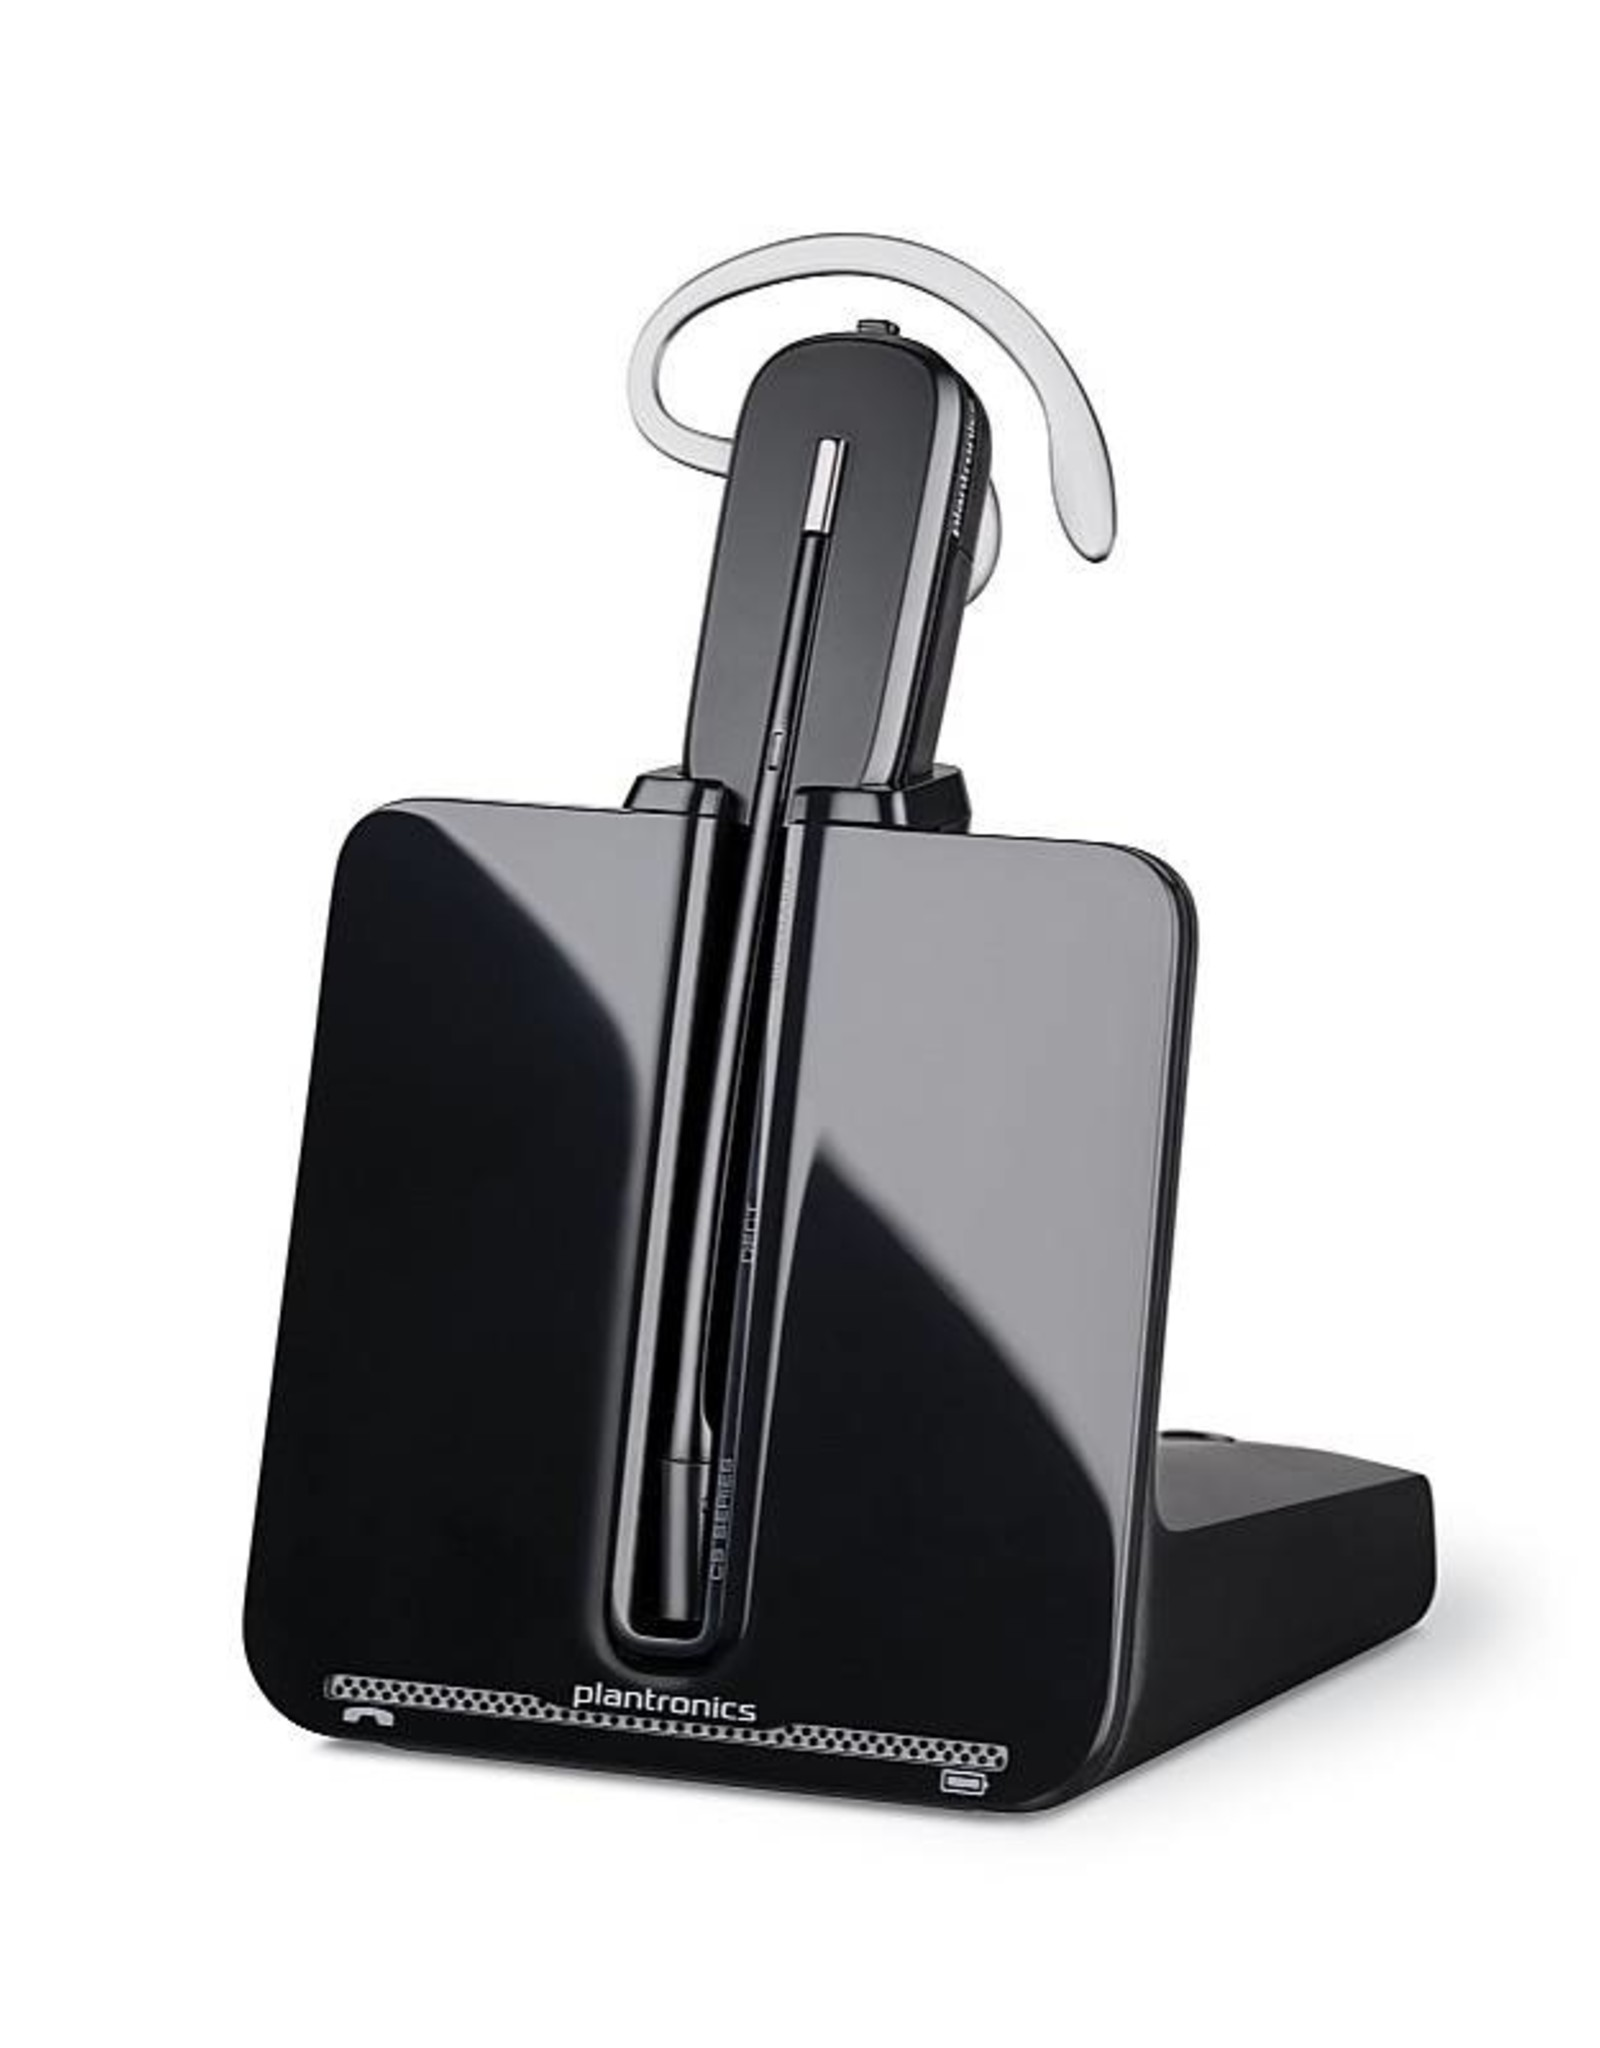 Plantronics Plantronics CS540 DECT Headset System, Convertible